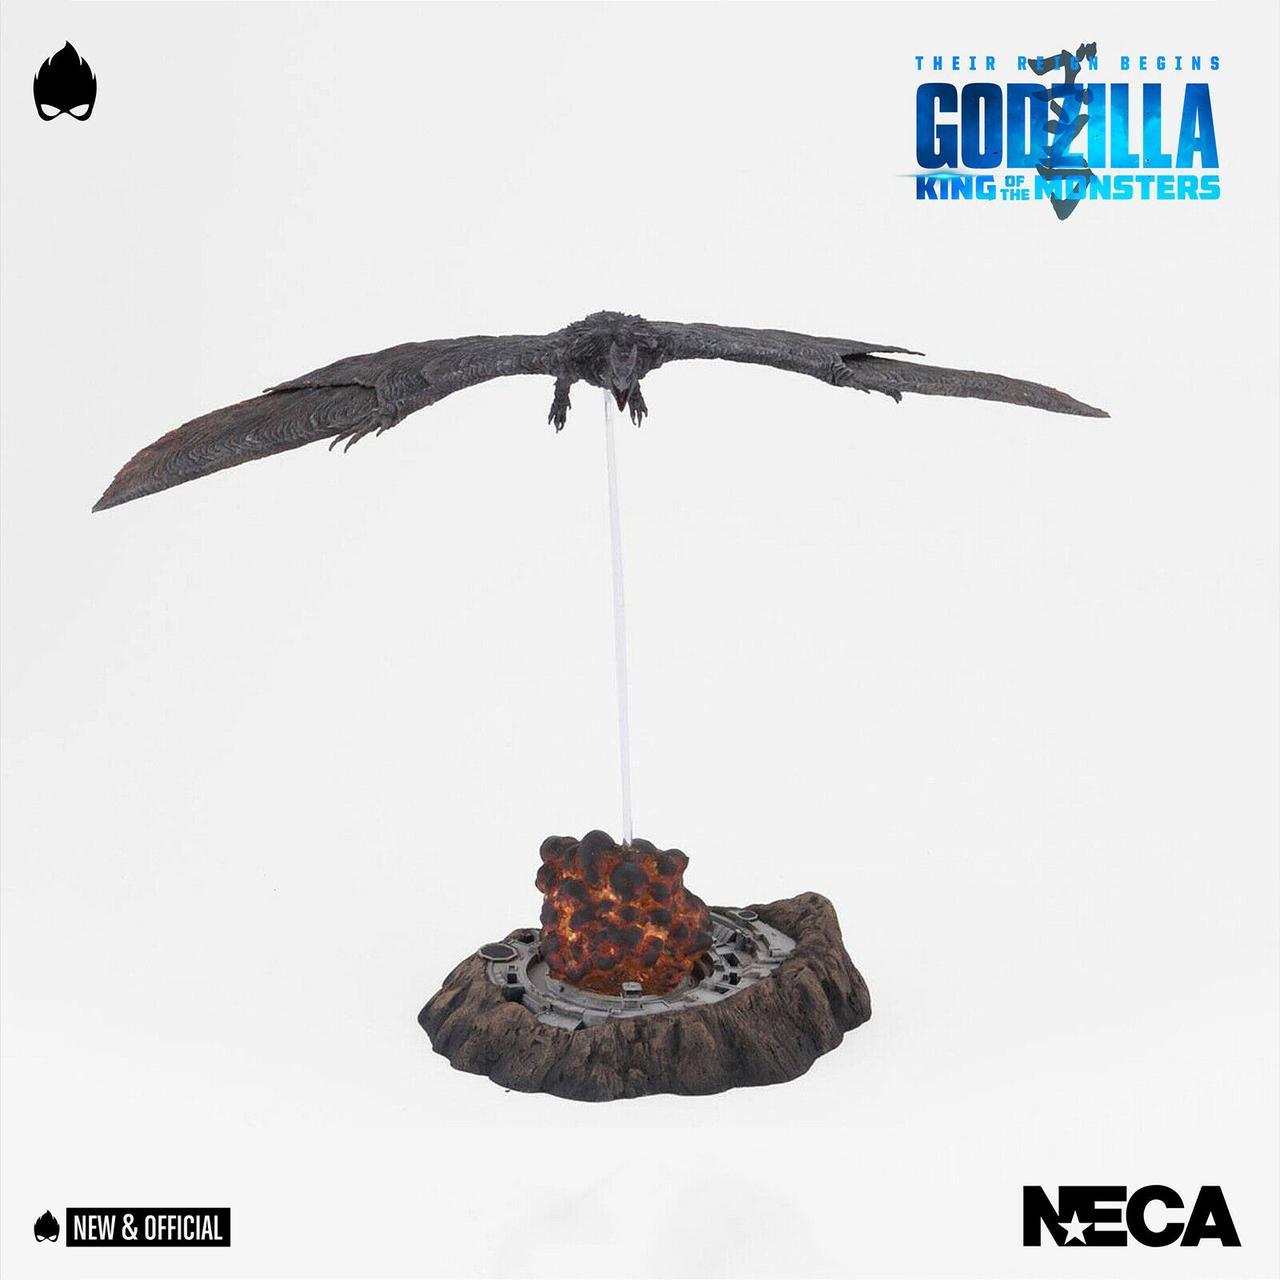 Neca «Годзилла 2: Король монстров» Фигурка Родан, 2019 года